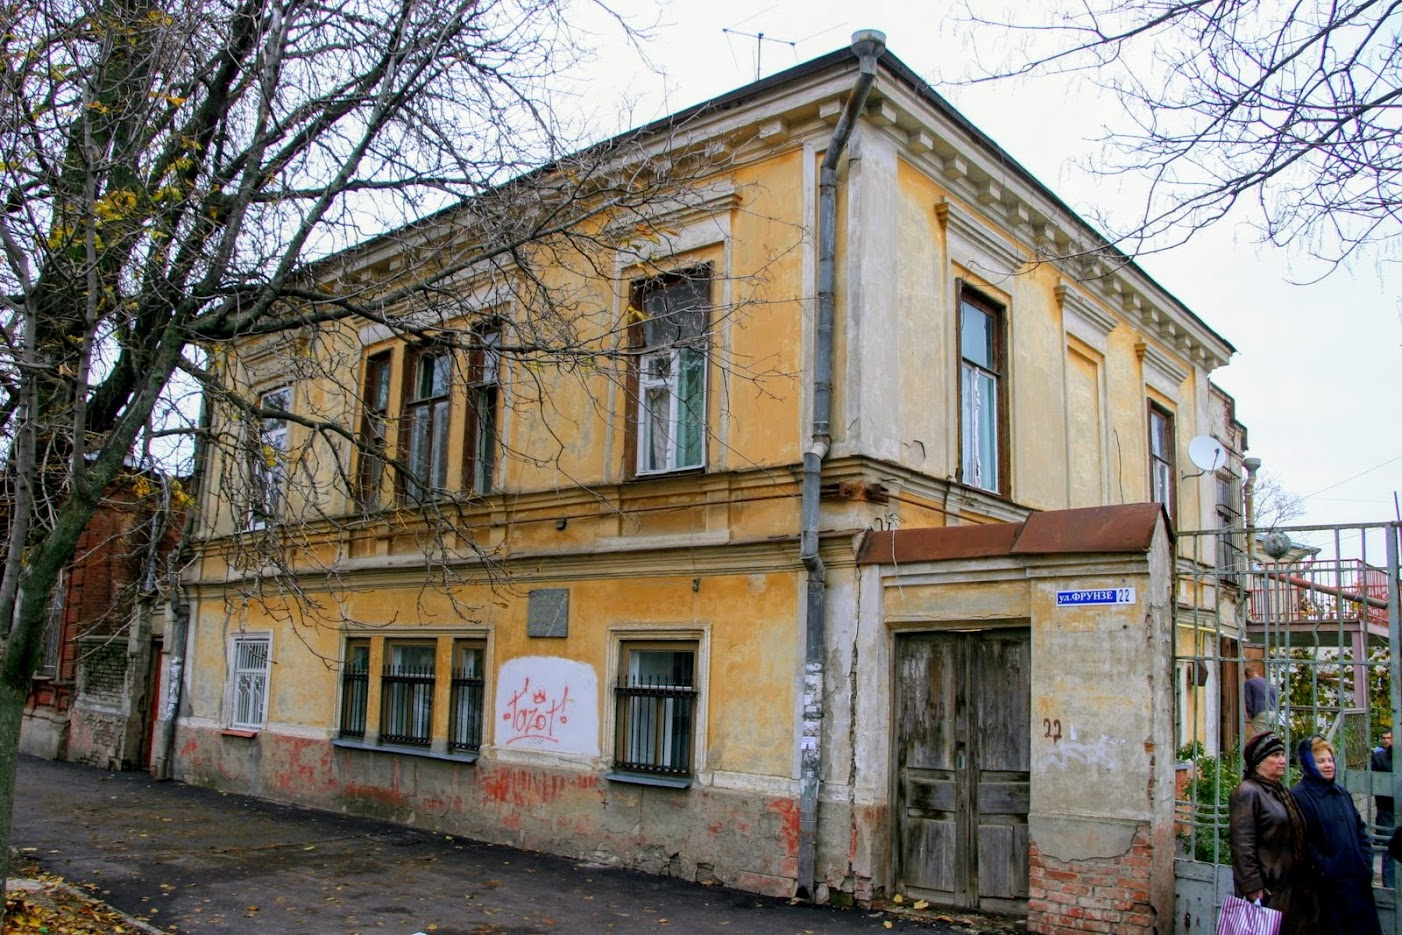 https://sites.google.com/site/istoriceskijtaganrog/frunze-ulica/dom-22